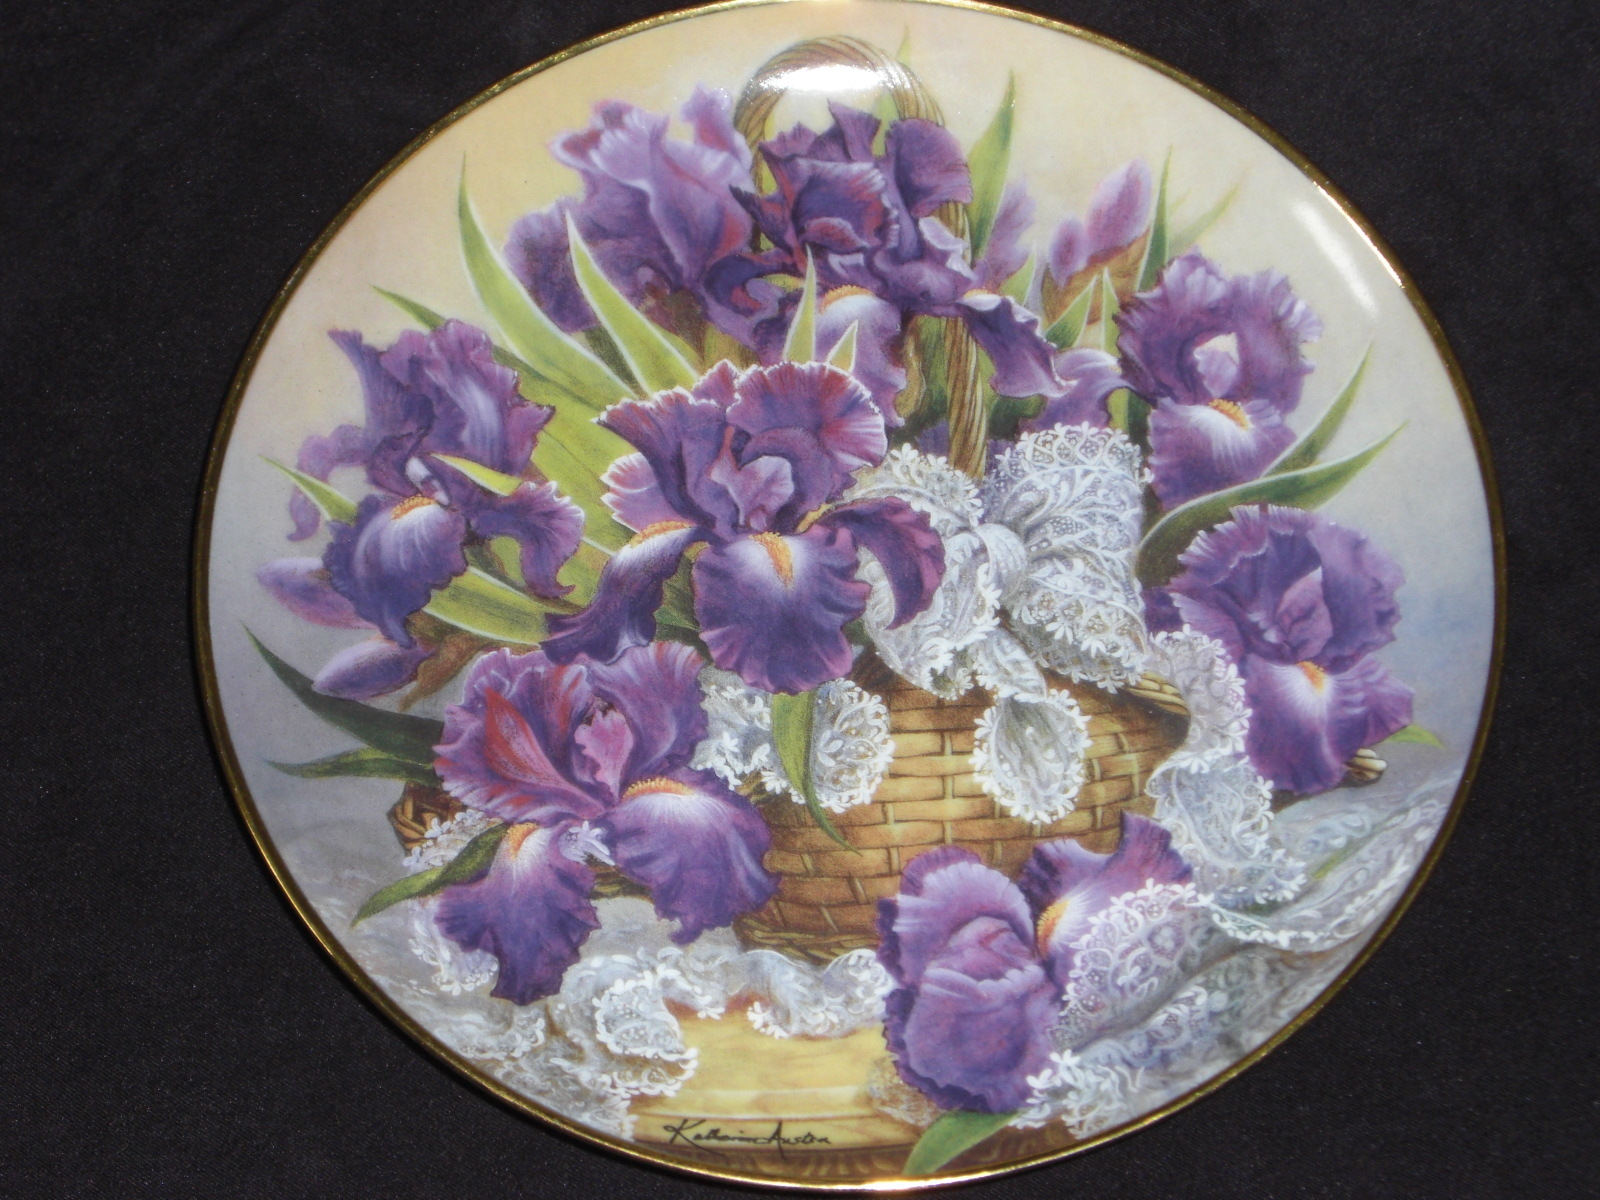 Rare FRANKLIN MINT Mogambo IRIS Plate Katherine Austen Limited Edition